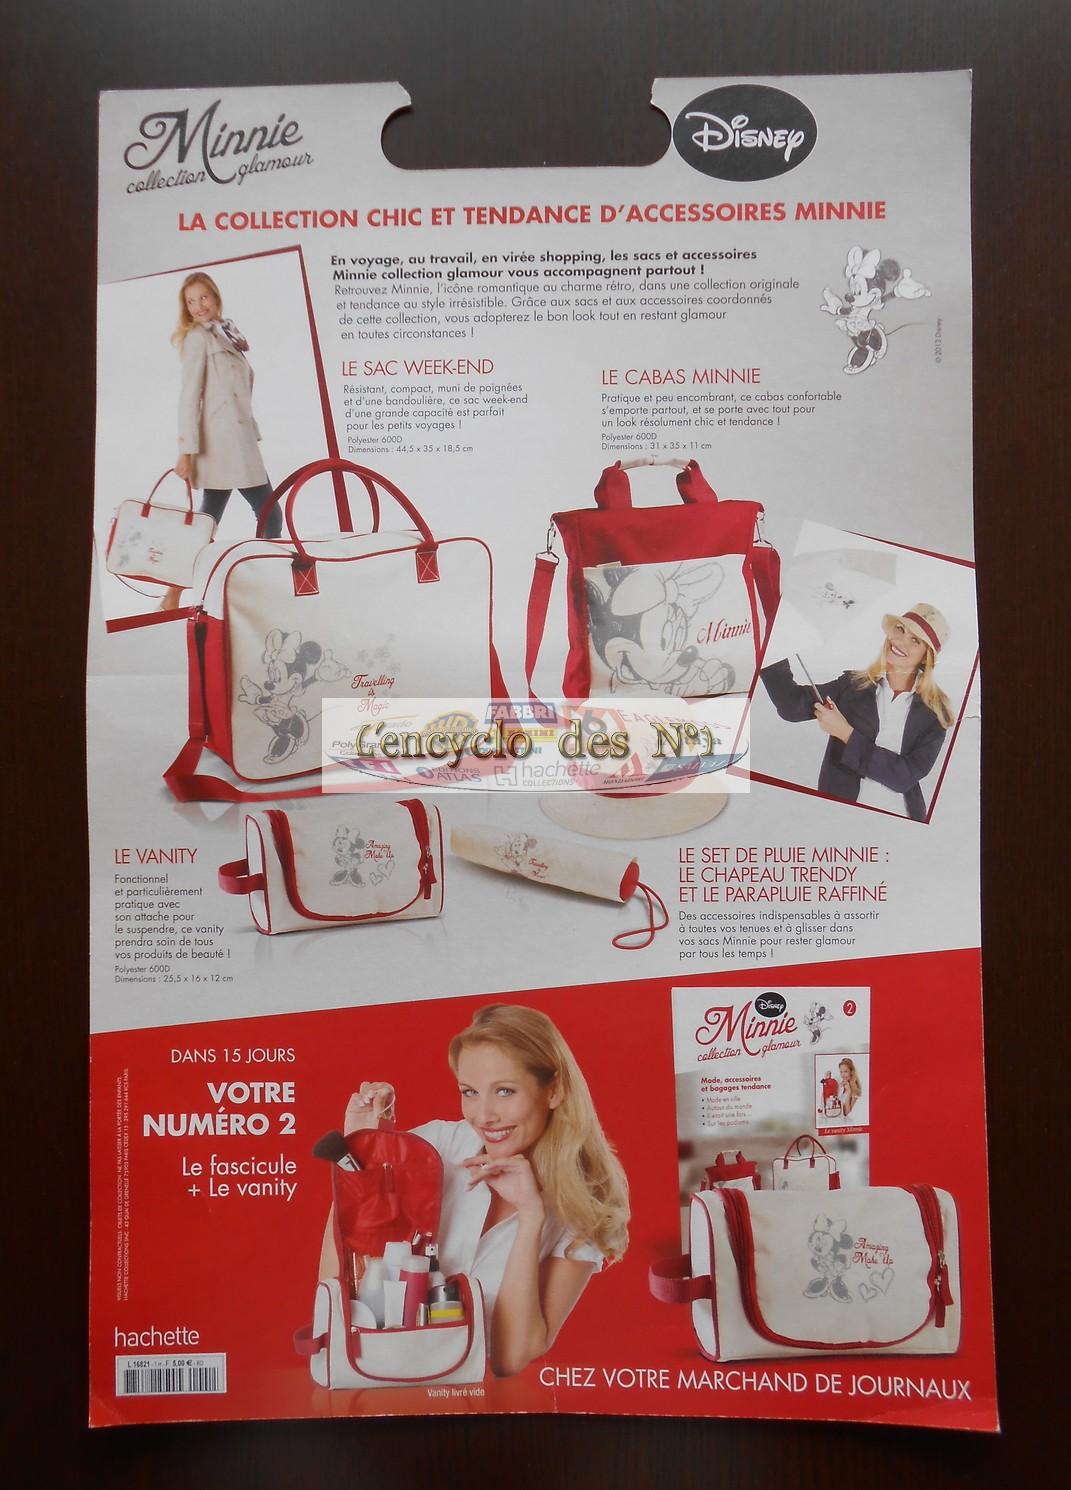 N° 1 Minnie collection glamour - Hachette Test - Avril 2013 Nm0IYISv7TKbBnco0qq9v6PfIHQ